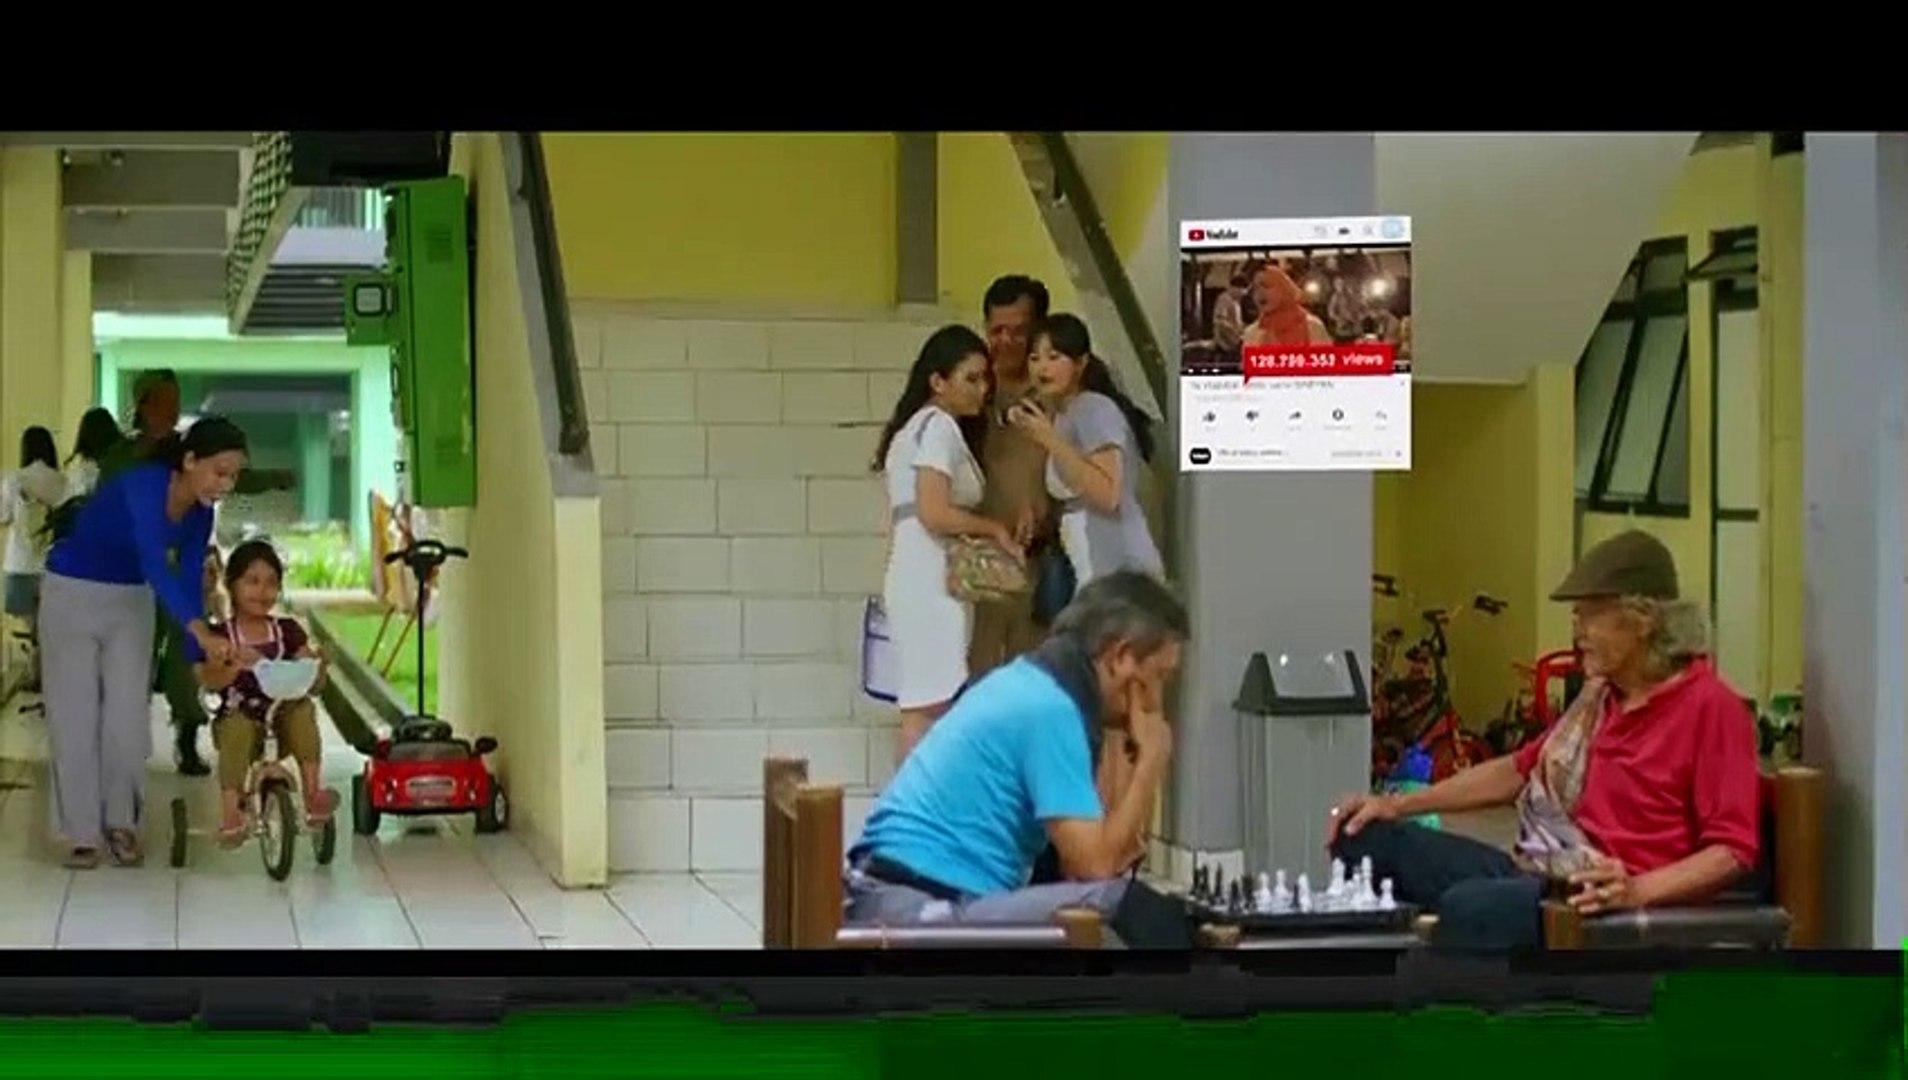 Pediashare Net Sabyan Menjemput Mimpi 2019 Webdl Savefilm21 Com 480p 2 Video Dailymotion